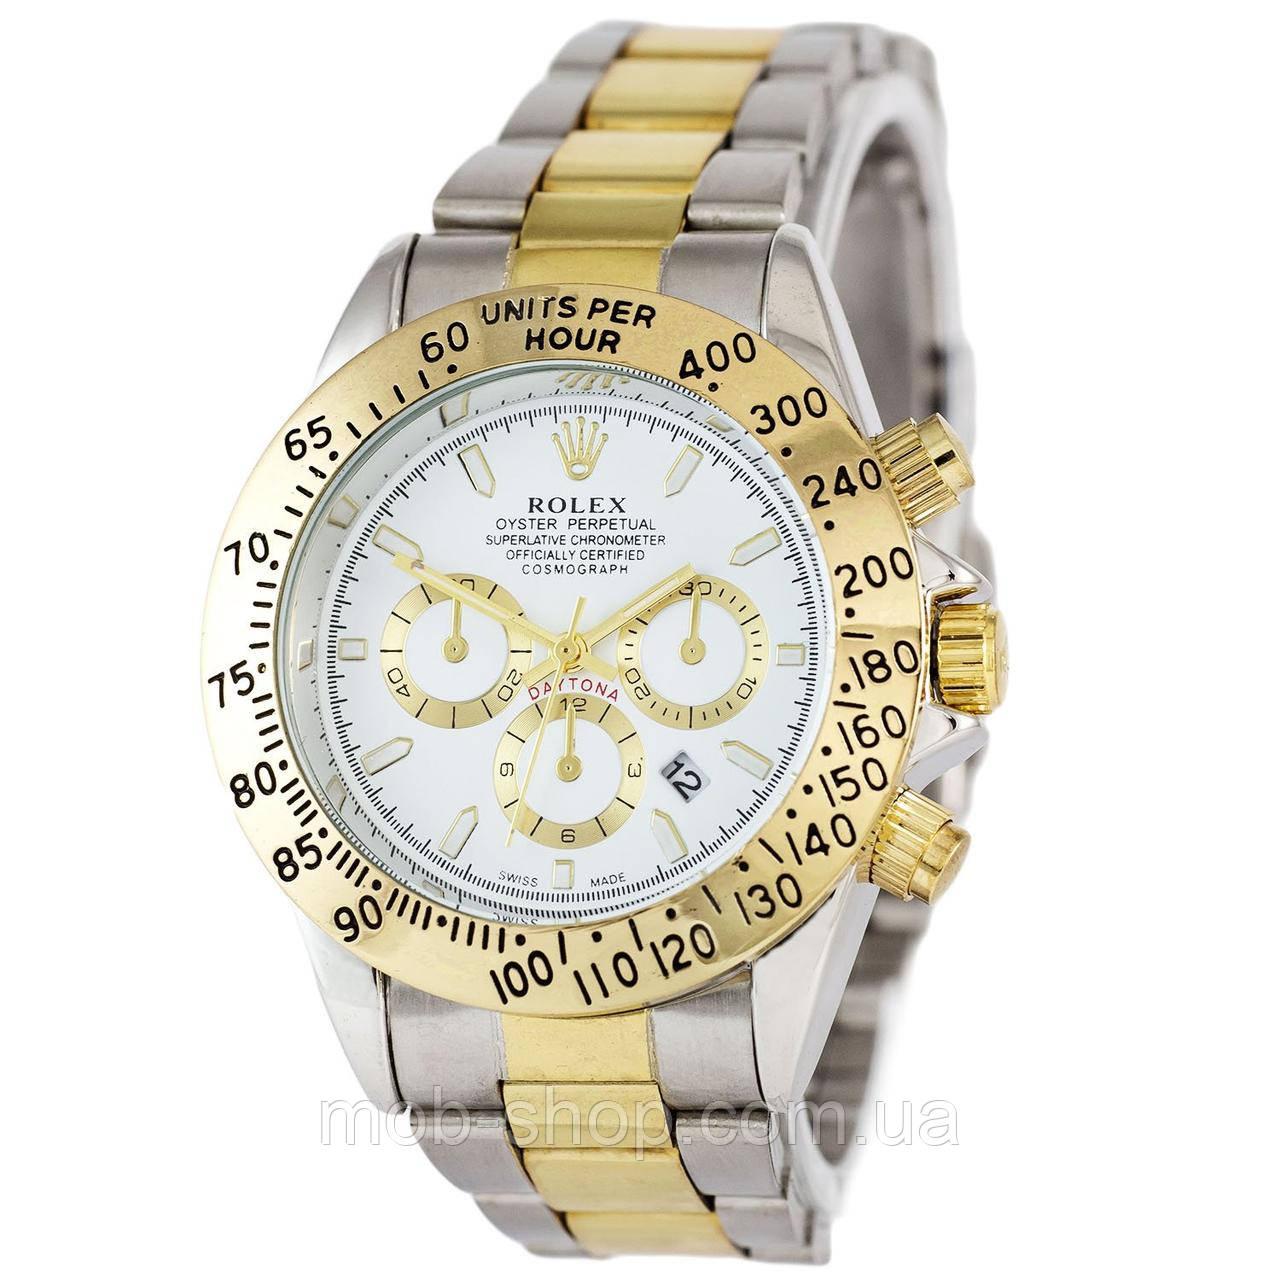 Наручные часы Rolex Daytona Quartz Date Silver-Gold-White